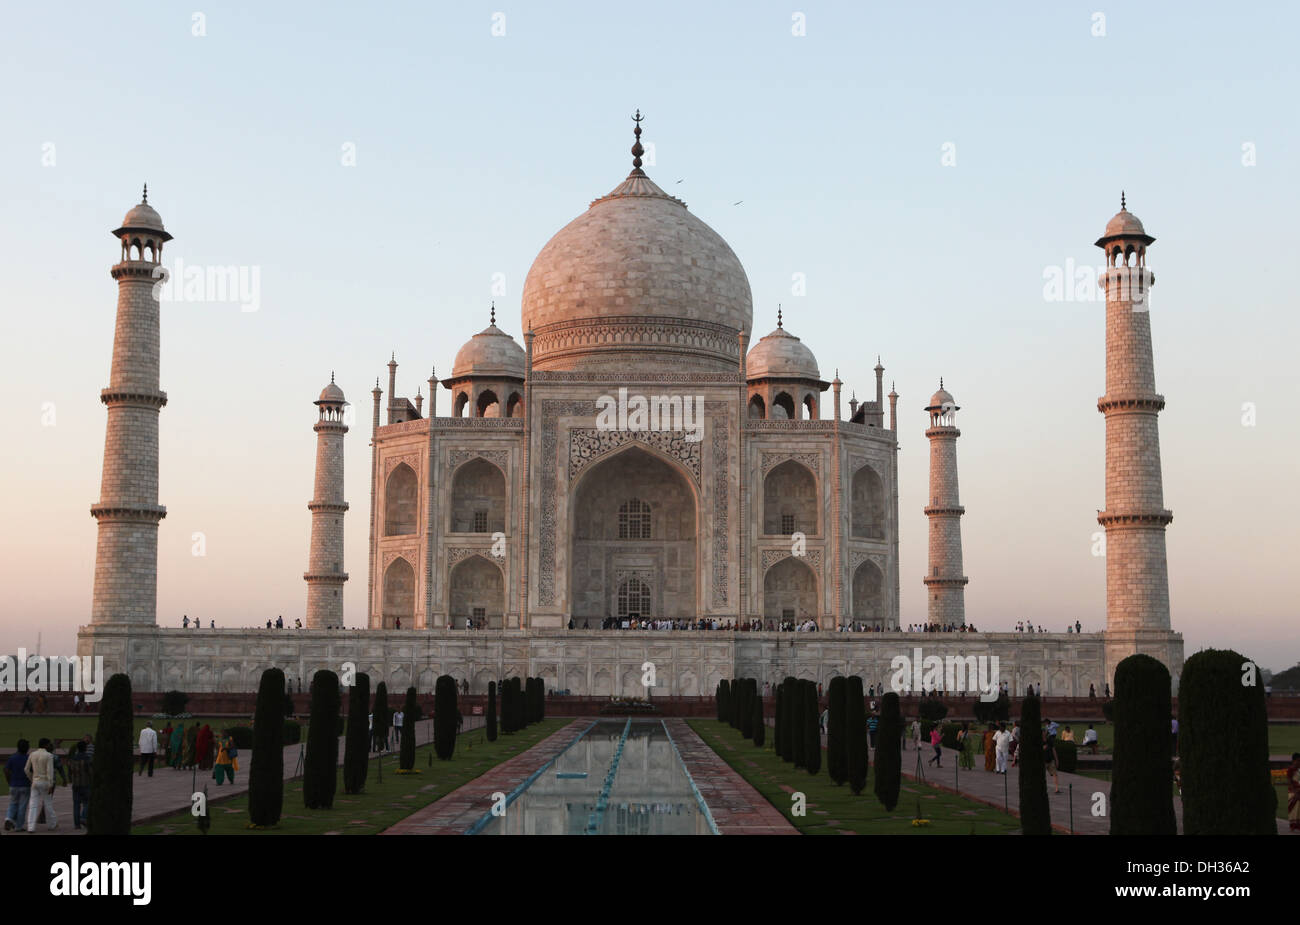 Taj Mahal al tramonto, Agra, Uttar Pradesh, India, Asia Immagini Stock